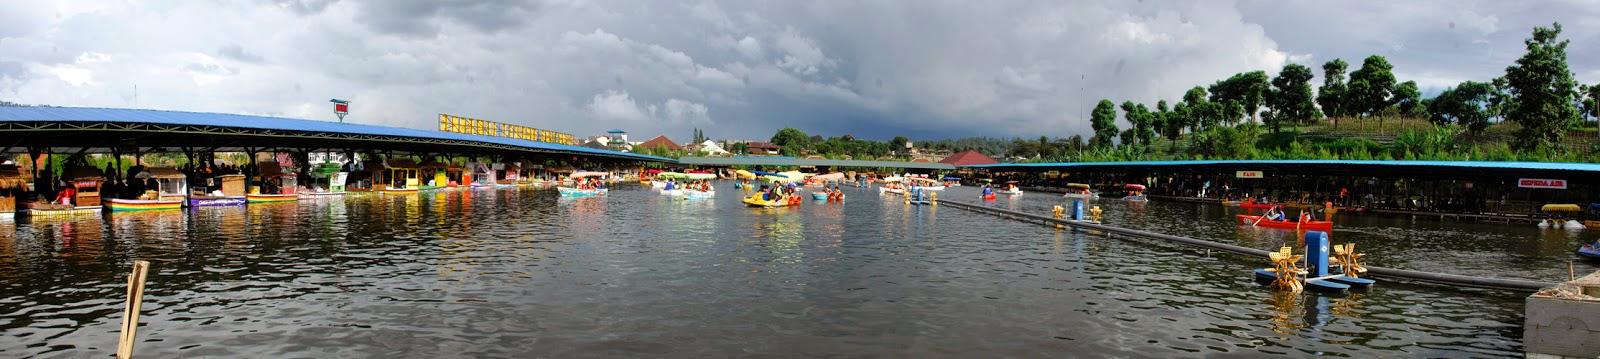 Awesome Floating Market Lembang Tempat Wisata Menarik Tidak Jauh Pasar